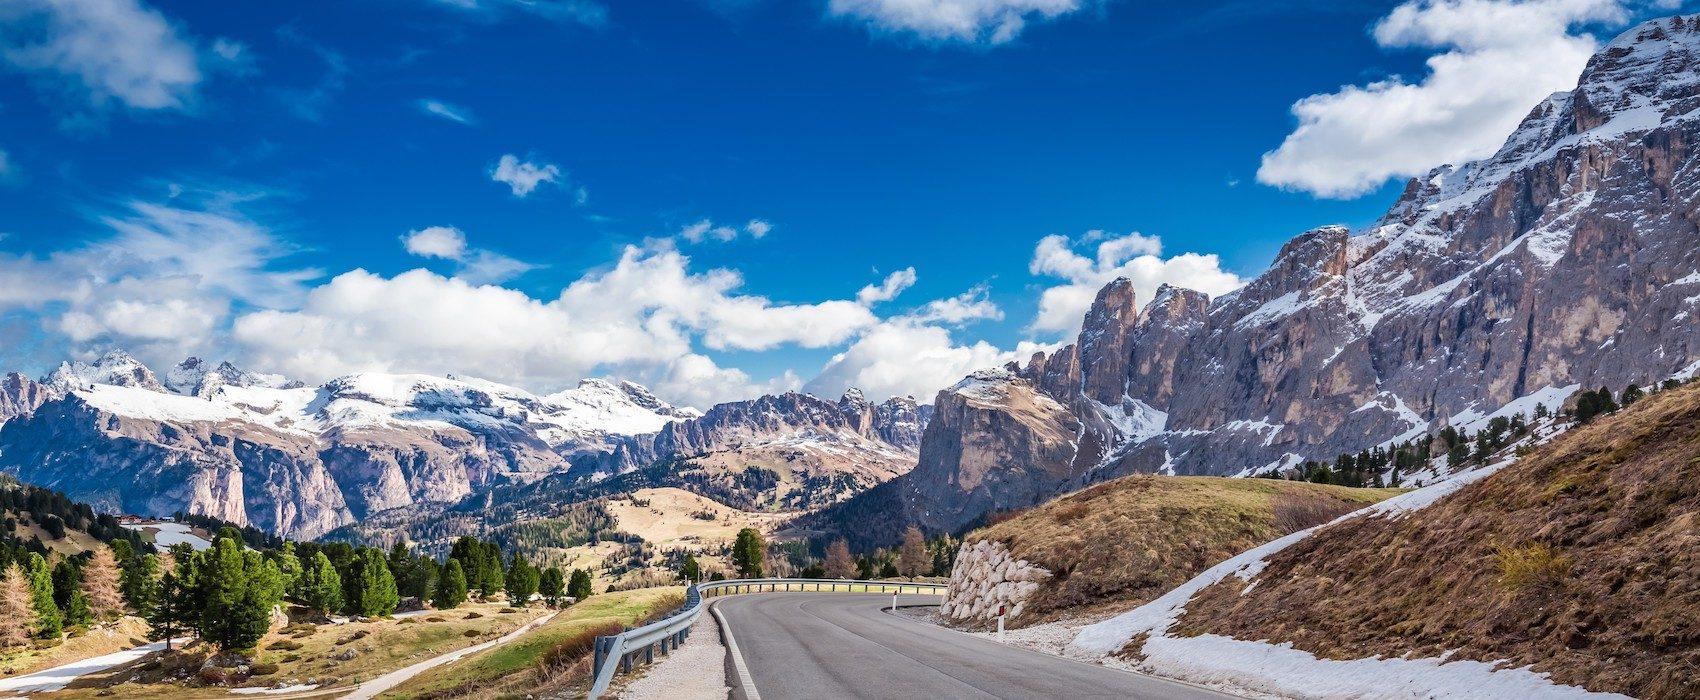 The Dolomites & Tyrol